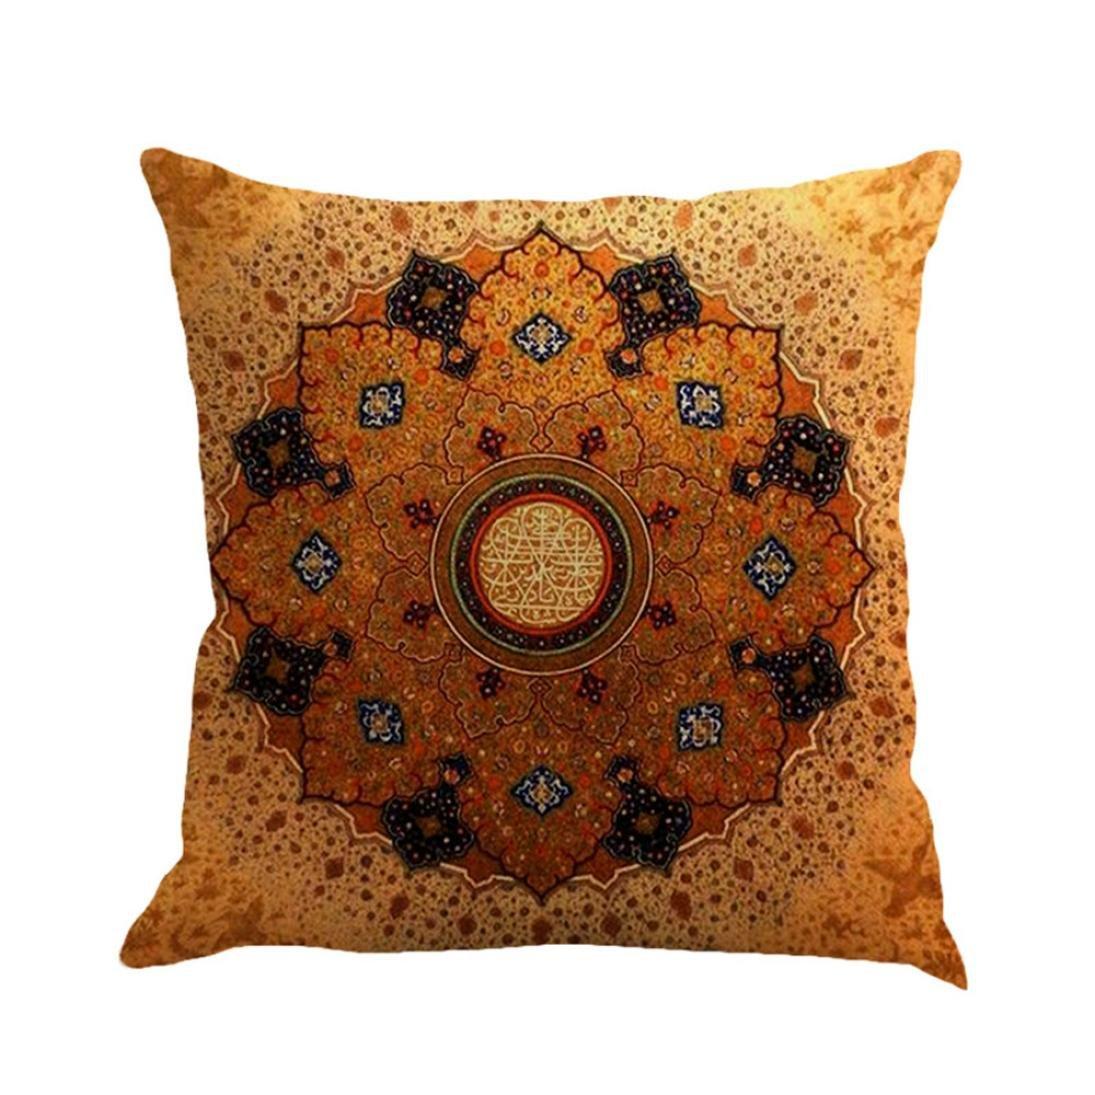 A sof/á funda de almohada decoraci/ón del hogar dise/ño de geometr/ía Winkey Funda de almohada cuadrada funda de coj/ín de lino 45cm*45cm//18*18